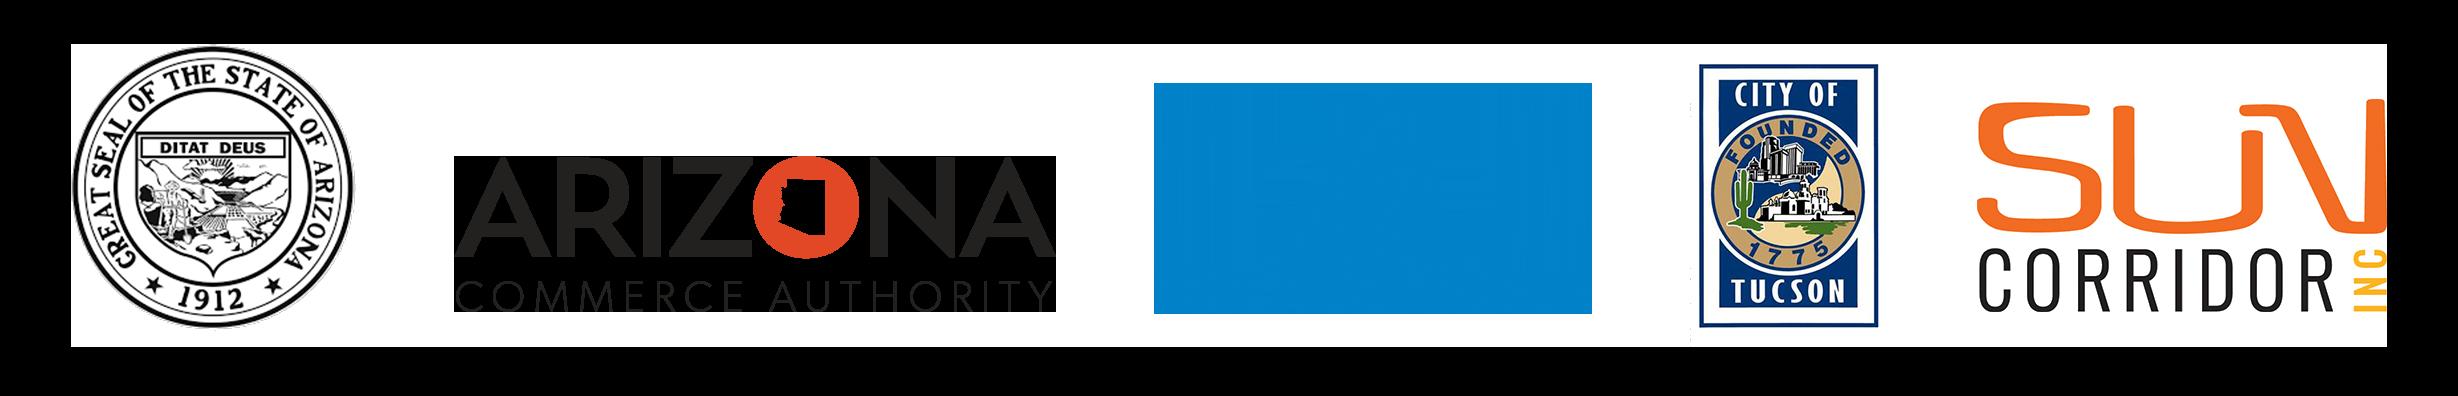 Logos of the State of Arizona, Arizona Commerce Authority, Pima County, City of Tucson, and Sun Corridor Inc.